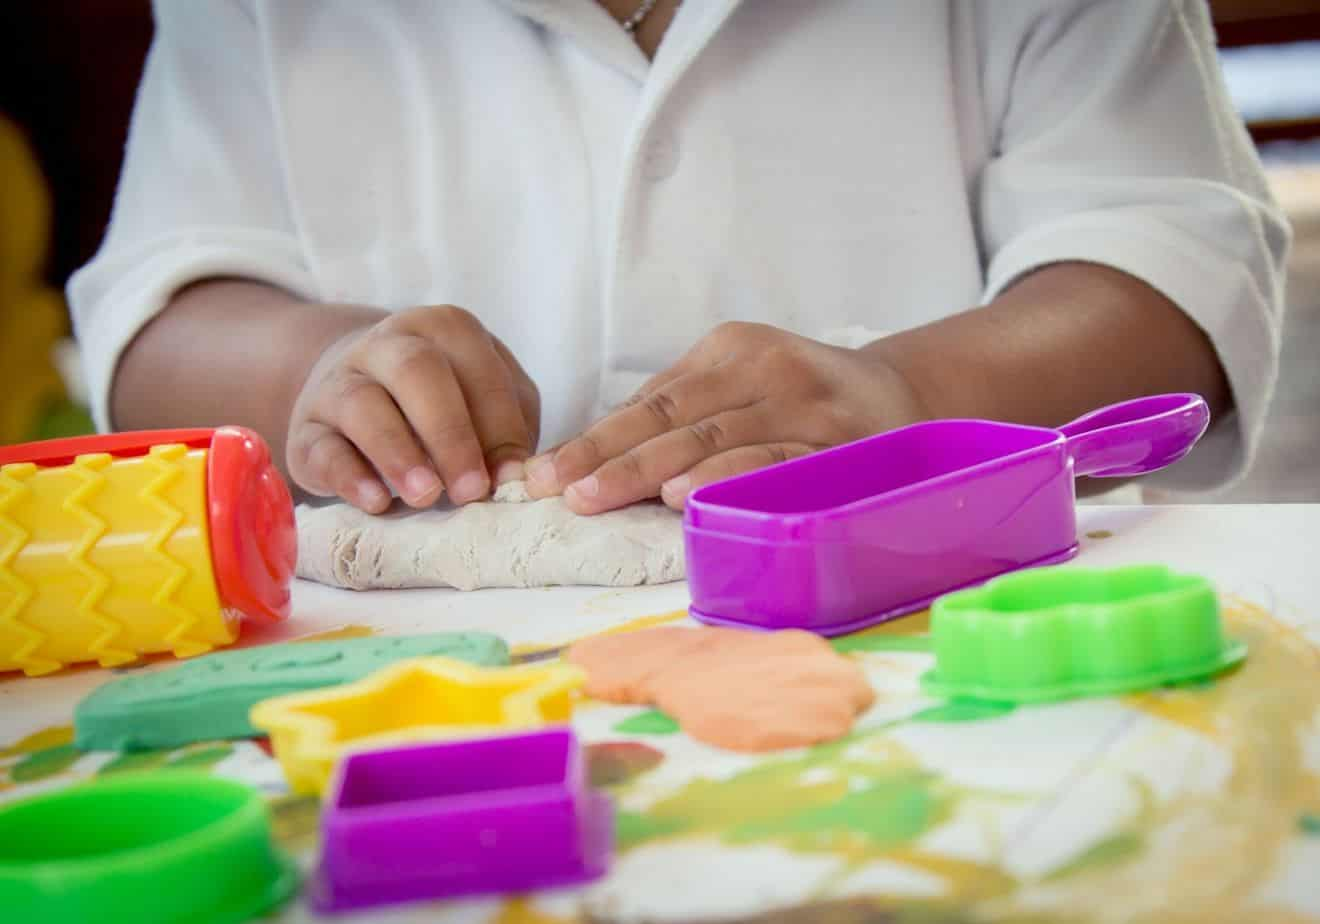 DIY playdoh for toddlers (indoor summer craft ideas)